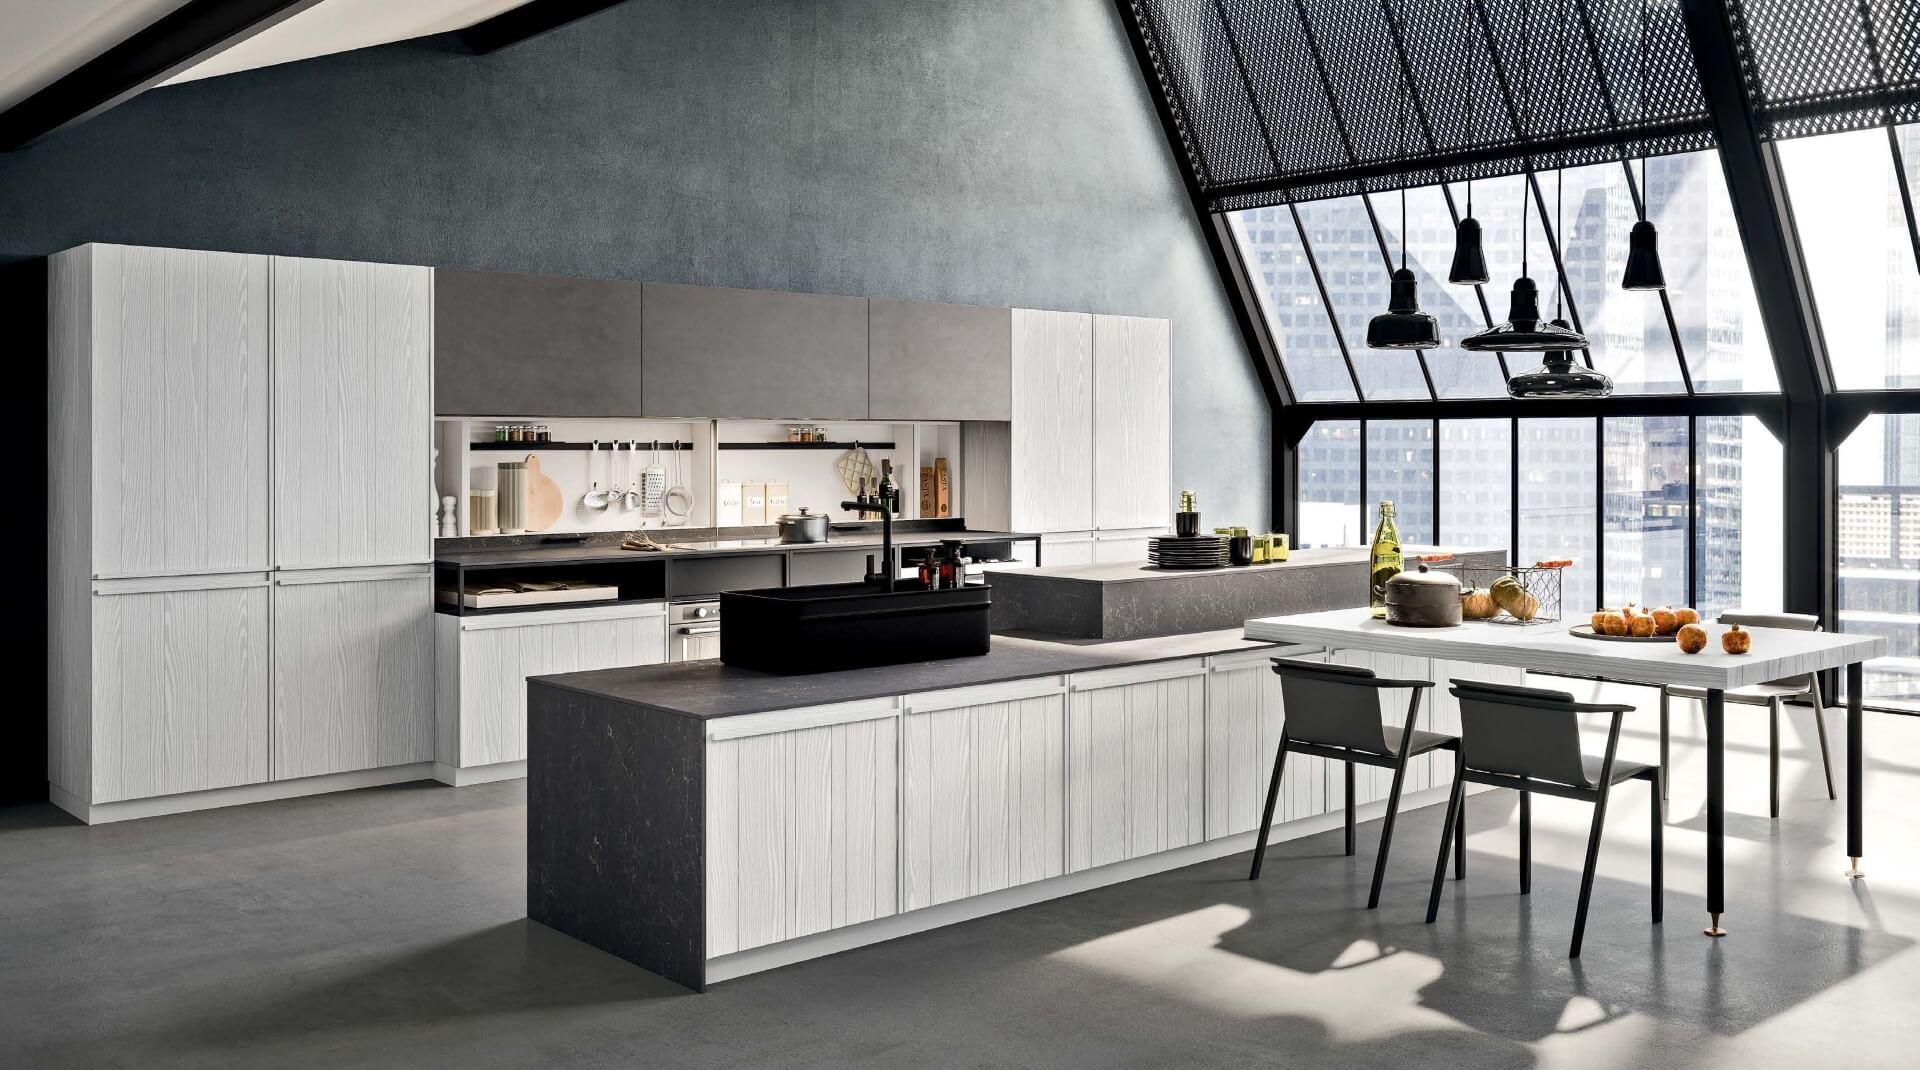 Cucine composit cucine moderne di design arredamento for Cucine di design outlet